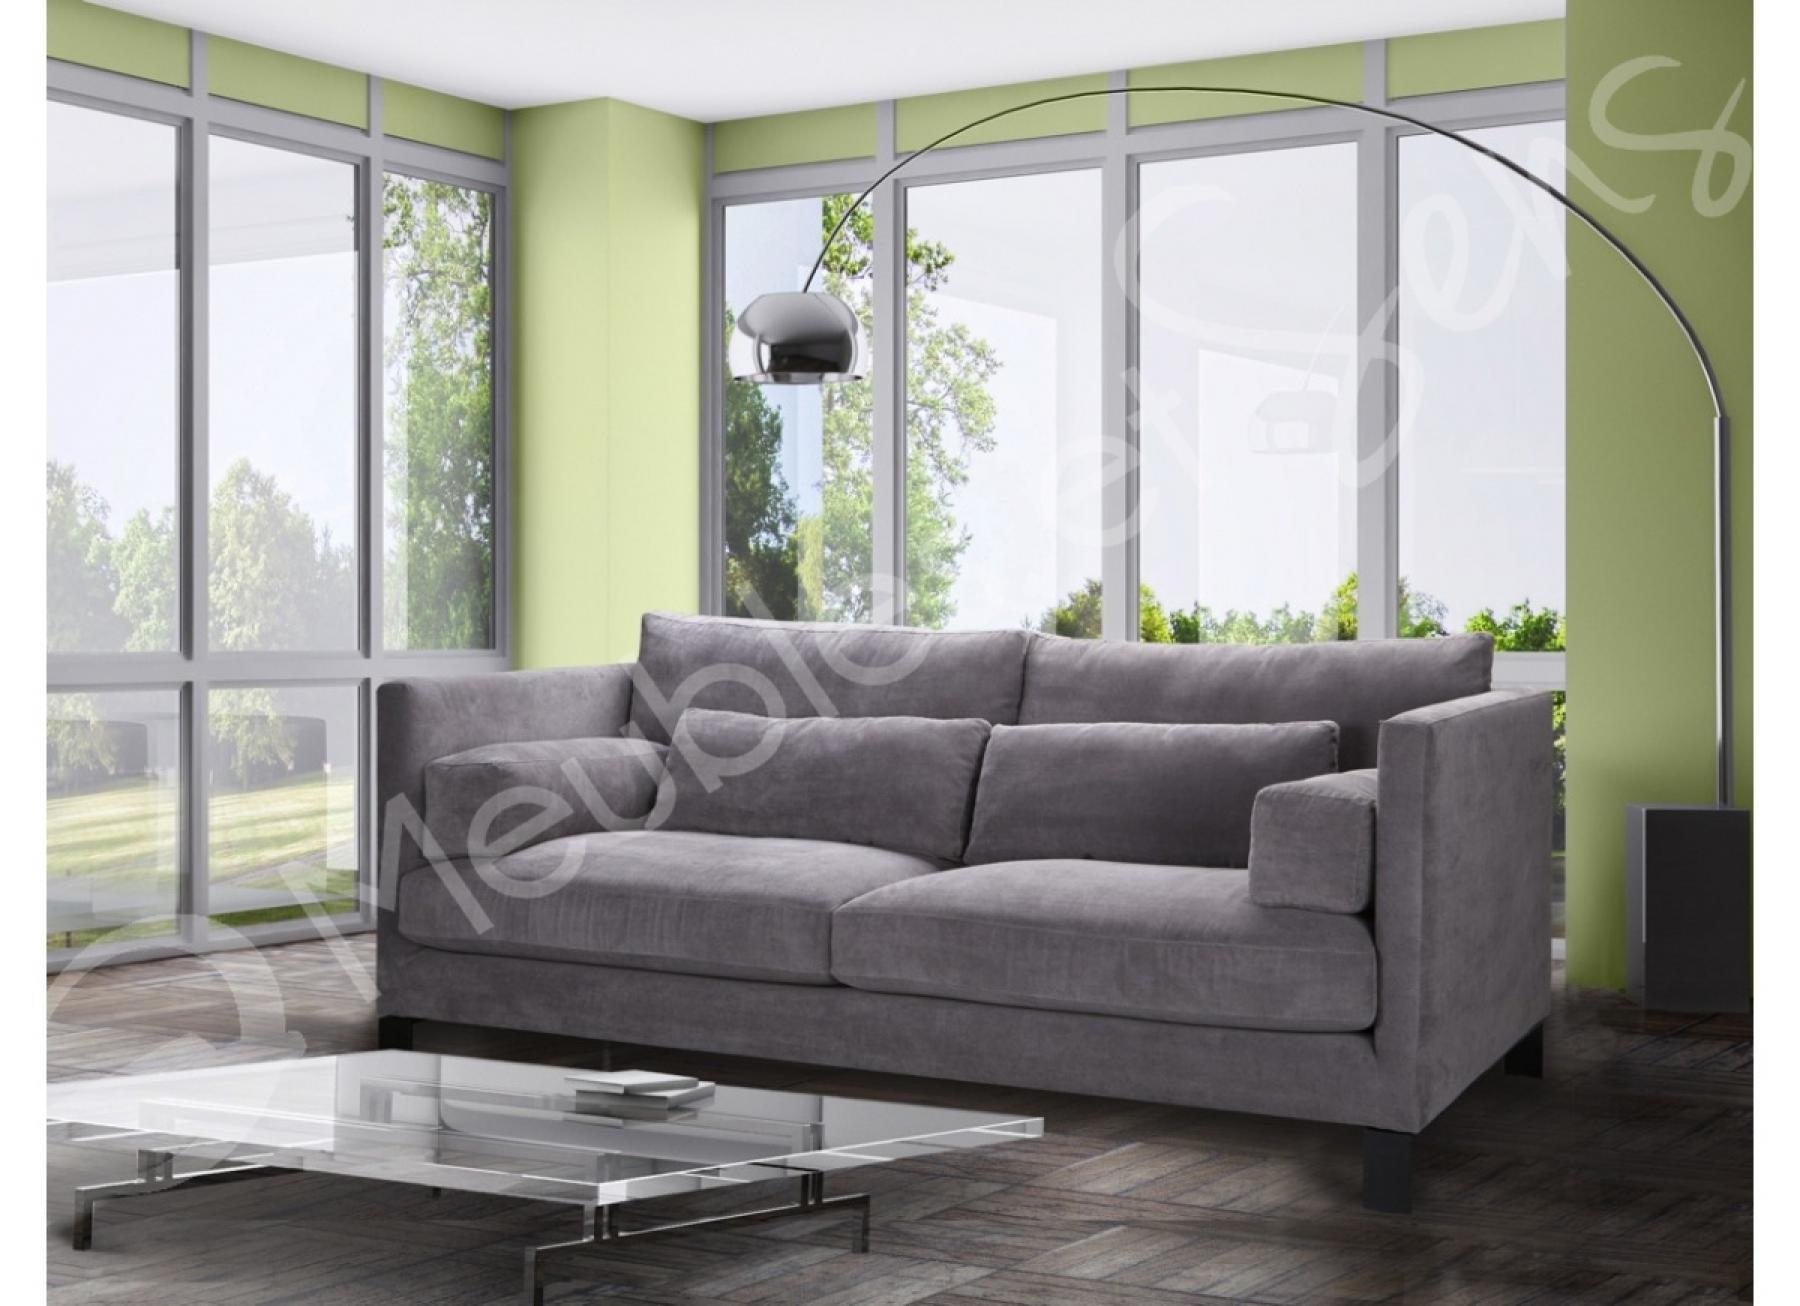 photos canap tissu confortable. Black Bedroom Furniture Sets. Home Design Ideas